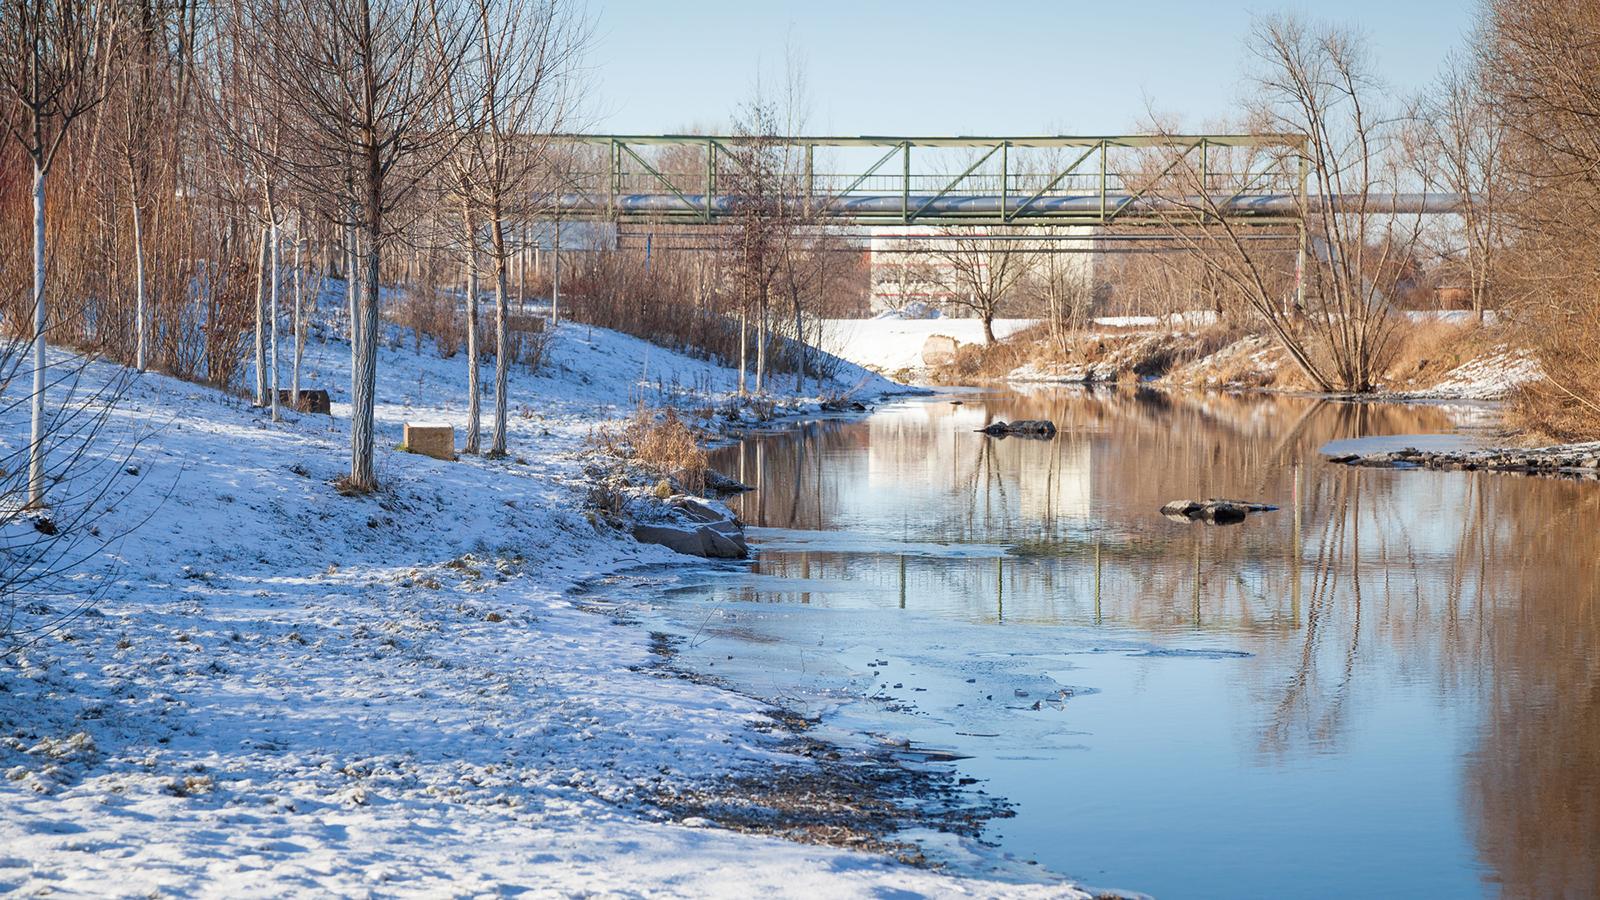 Brücke Gispersleben im Winter